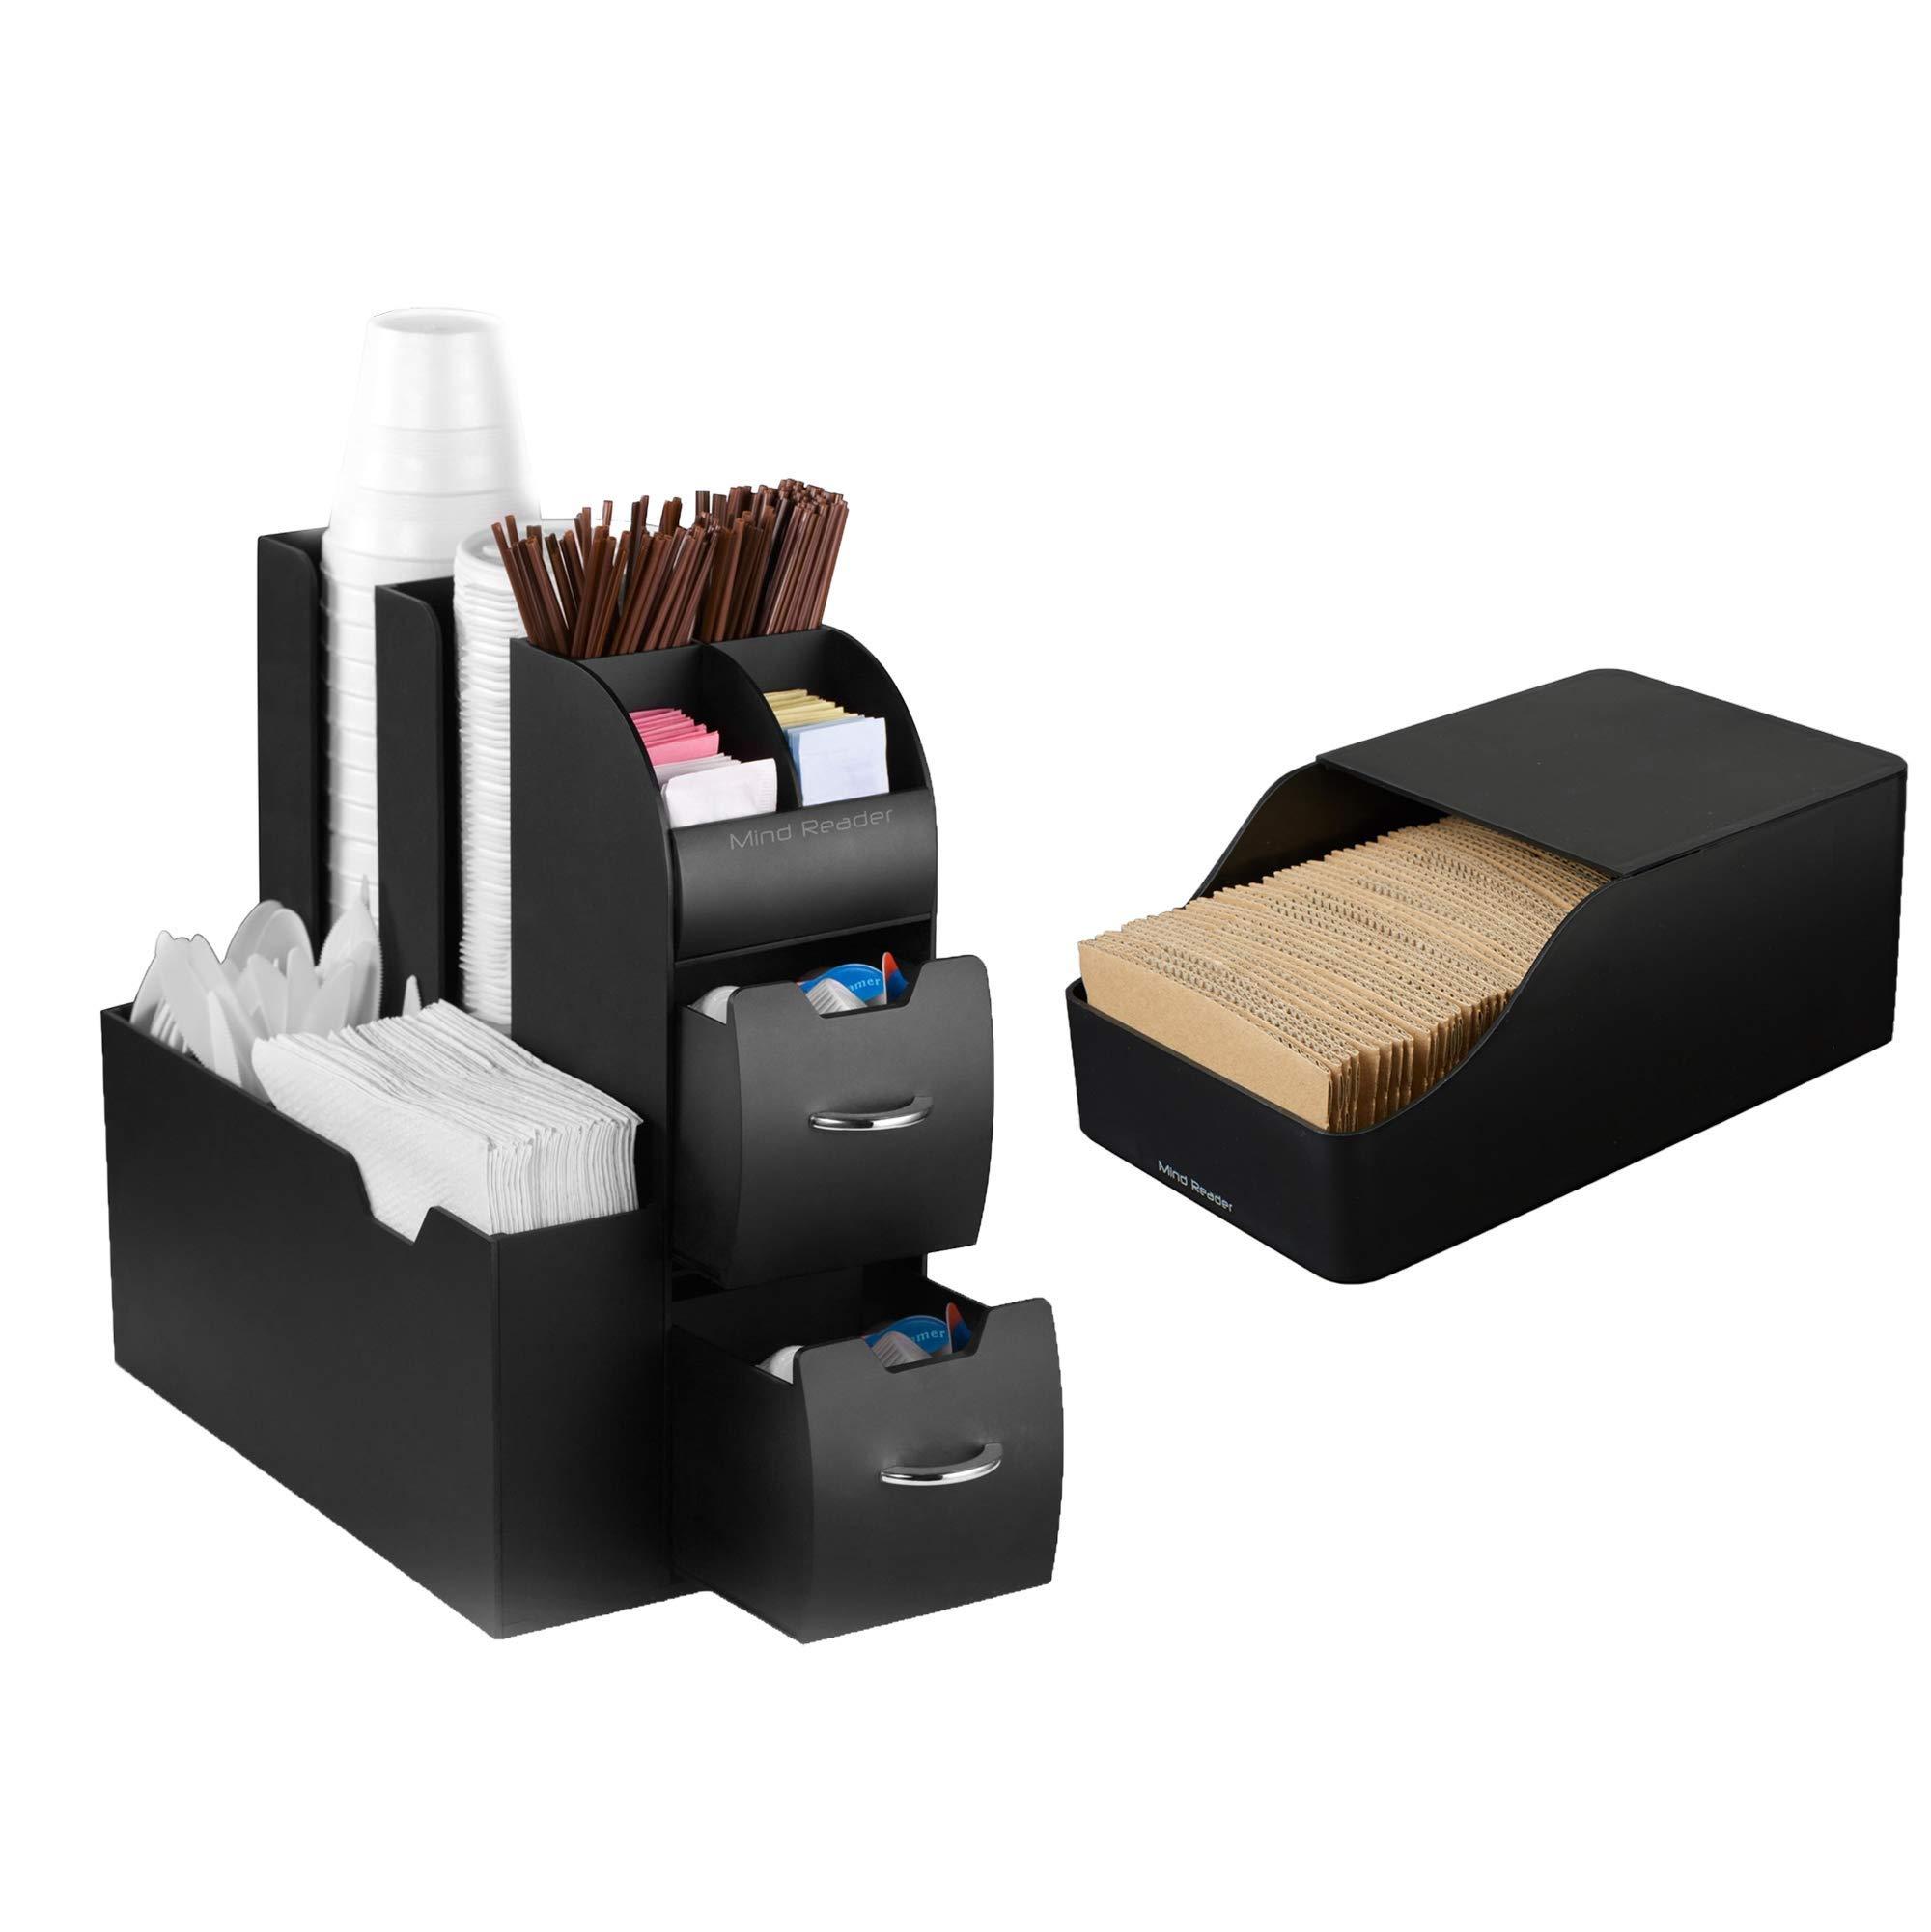 TM Miracle Store Living Room Office Kitchen Organizer Black Coffee Condiment Sleeve Dispenser Storage